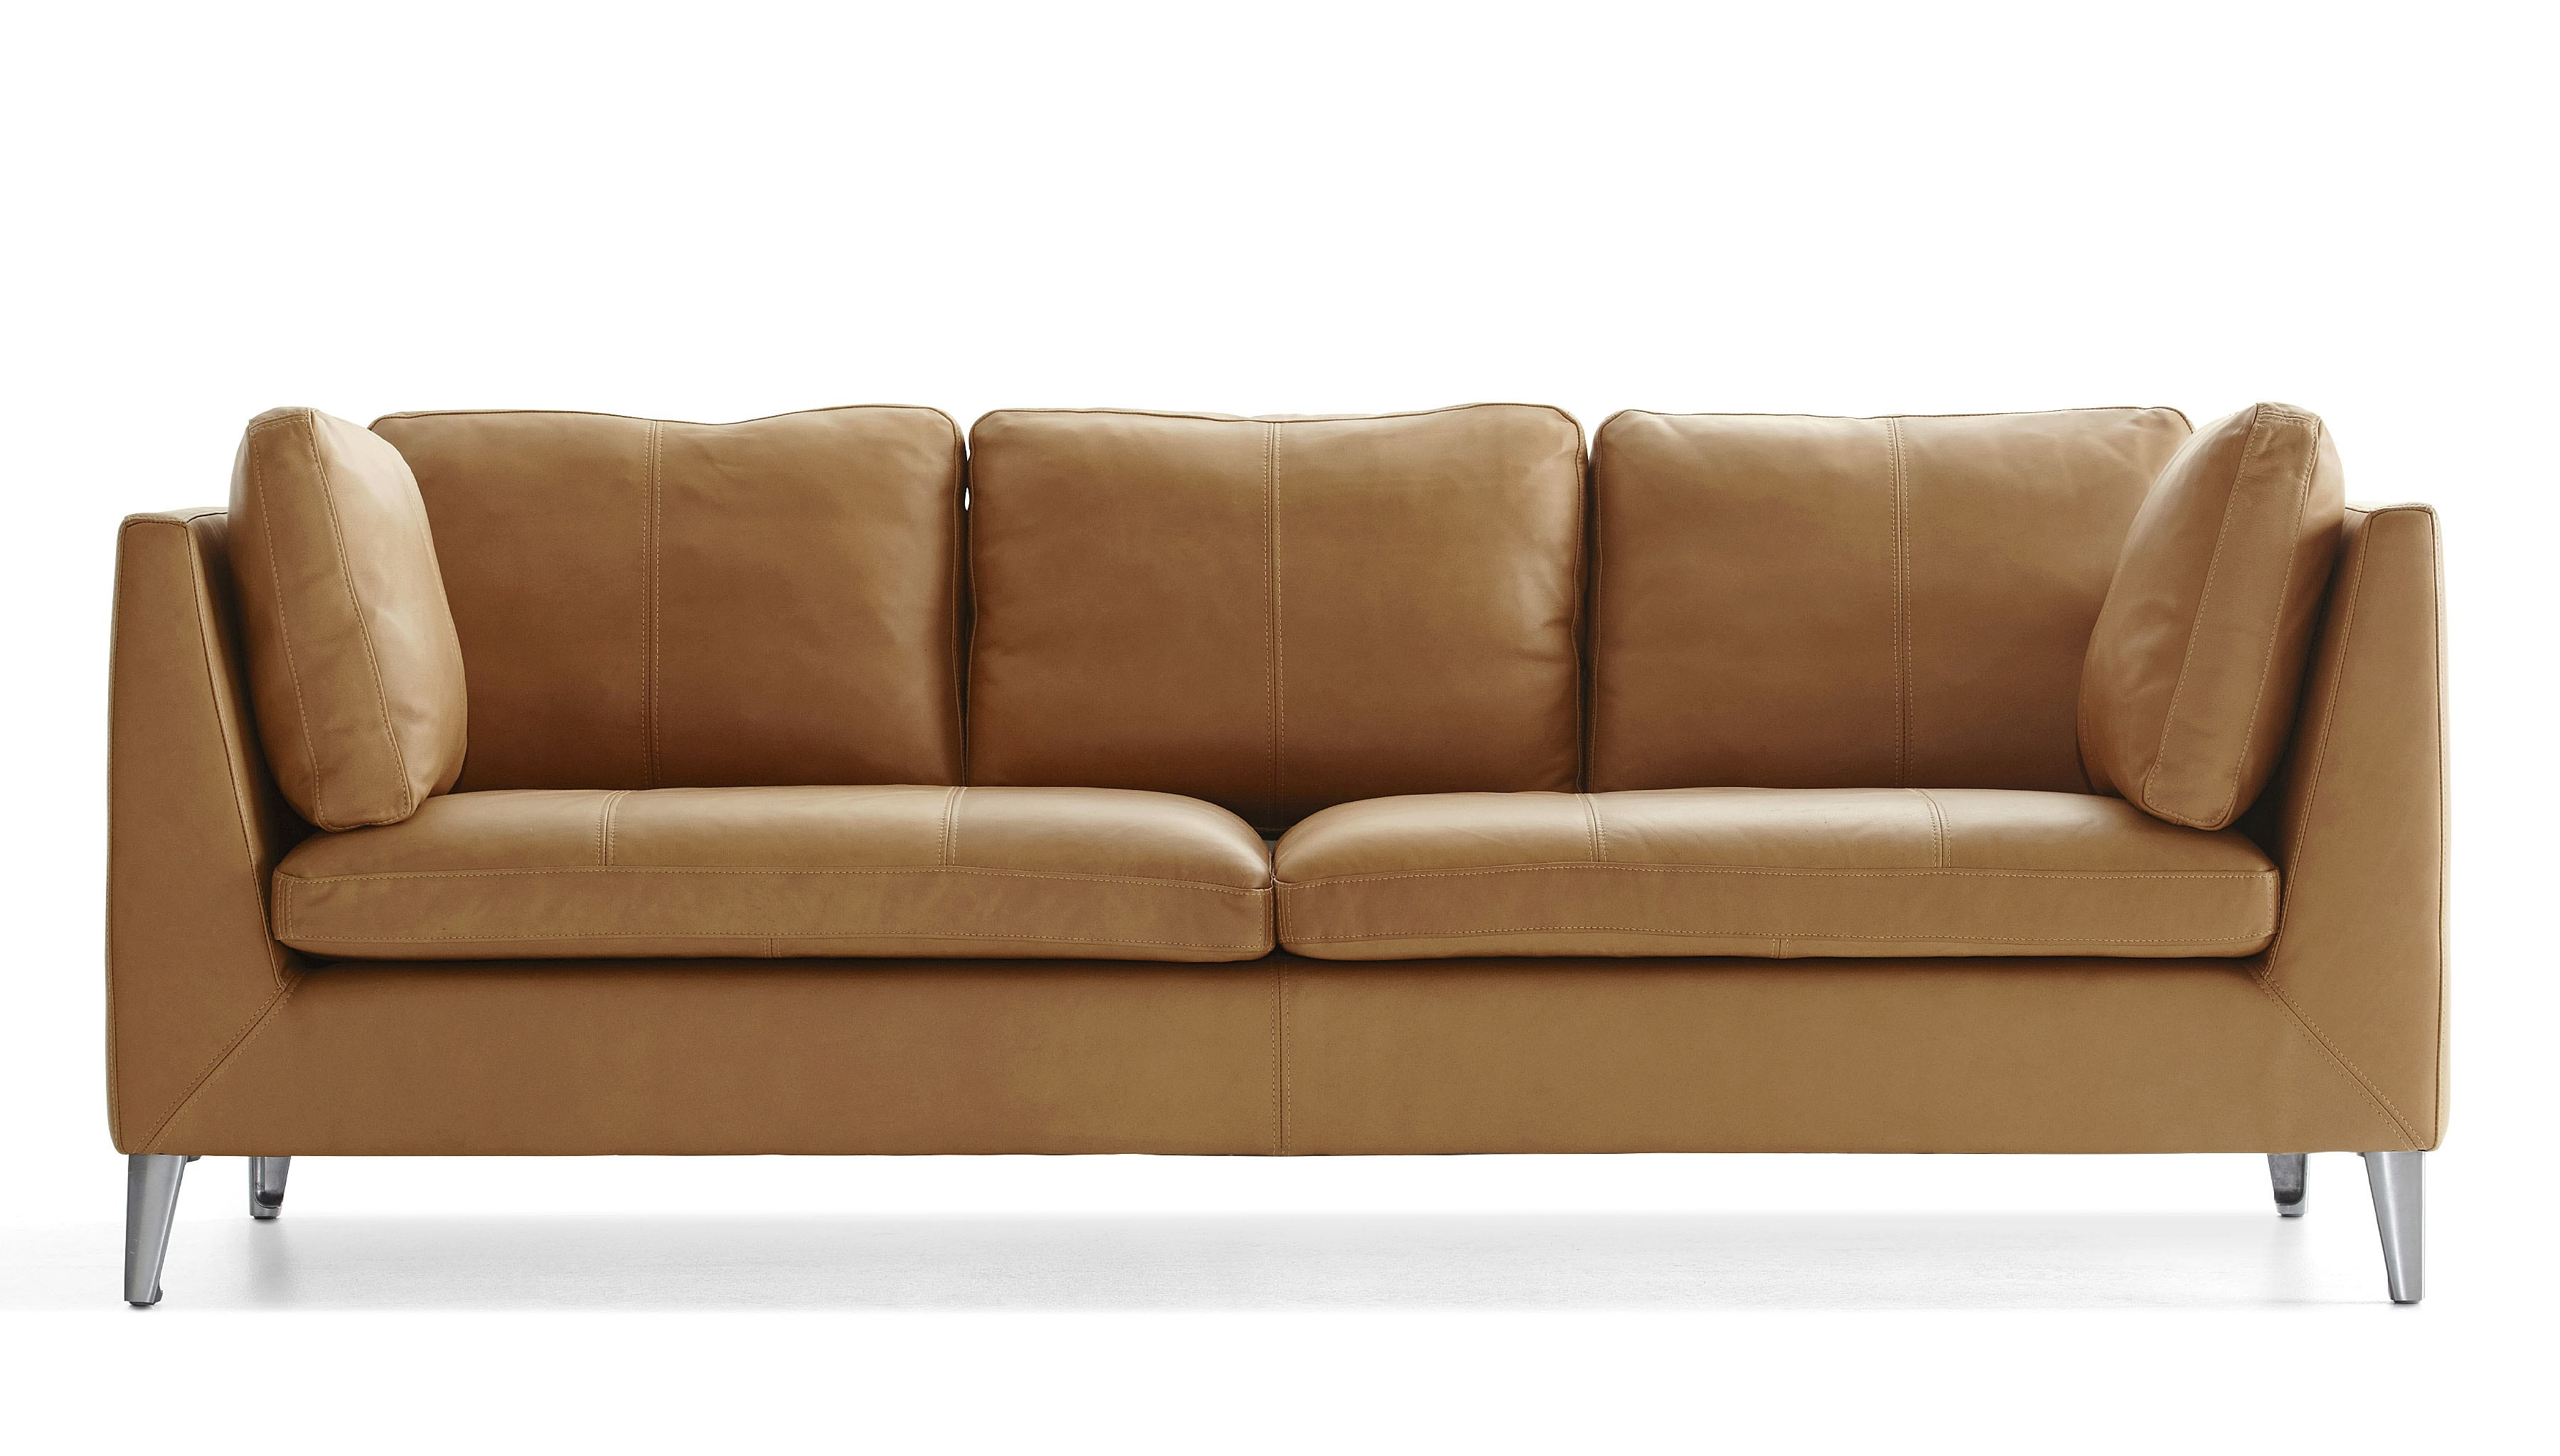 Sofas Ikea Baratos Zwdg sofà S Y Sillones Pra Online Ikea